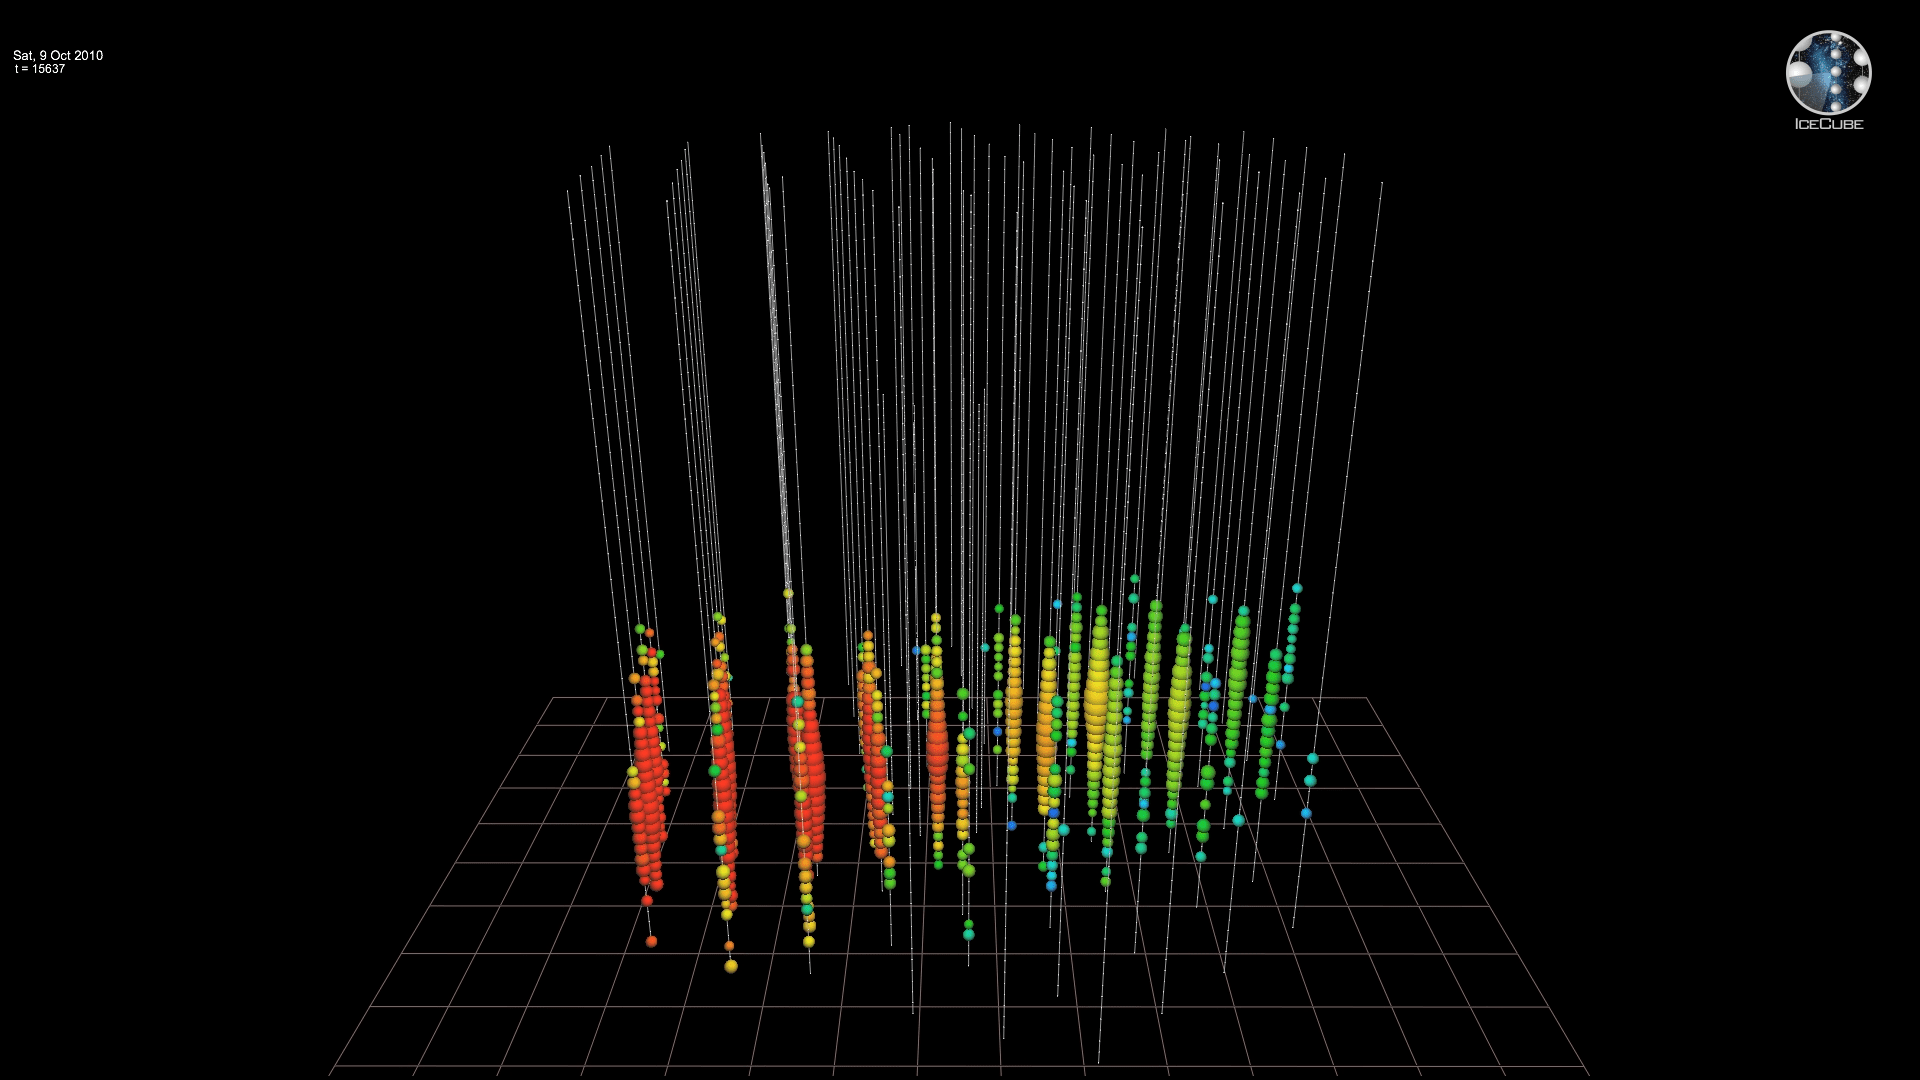 Video, IceCube Event ID 116701,6581938. Most probable neutrino energy: 466 TeV, October 9, 2010